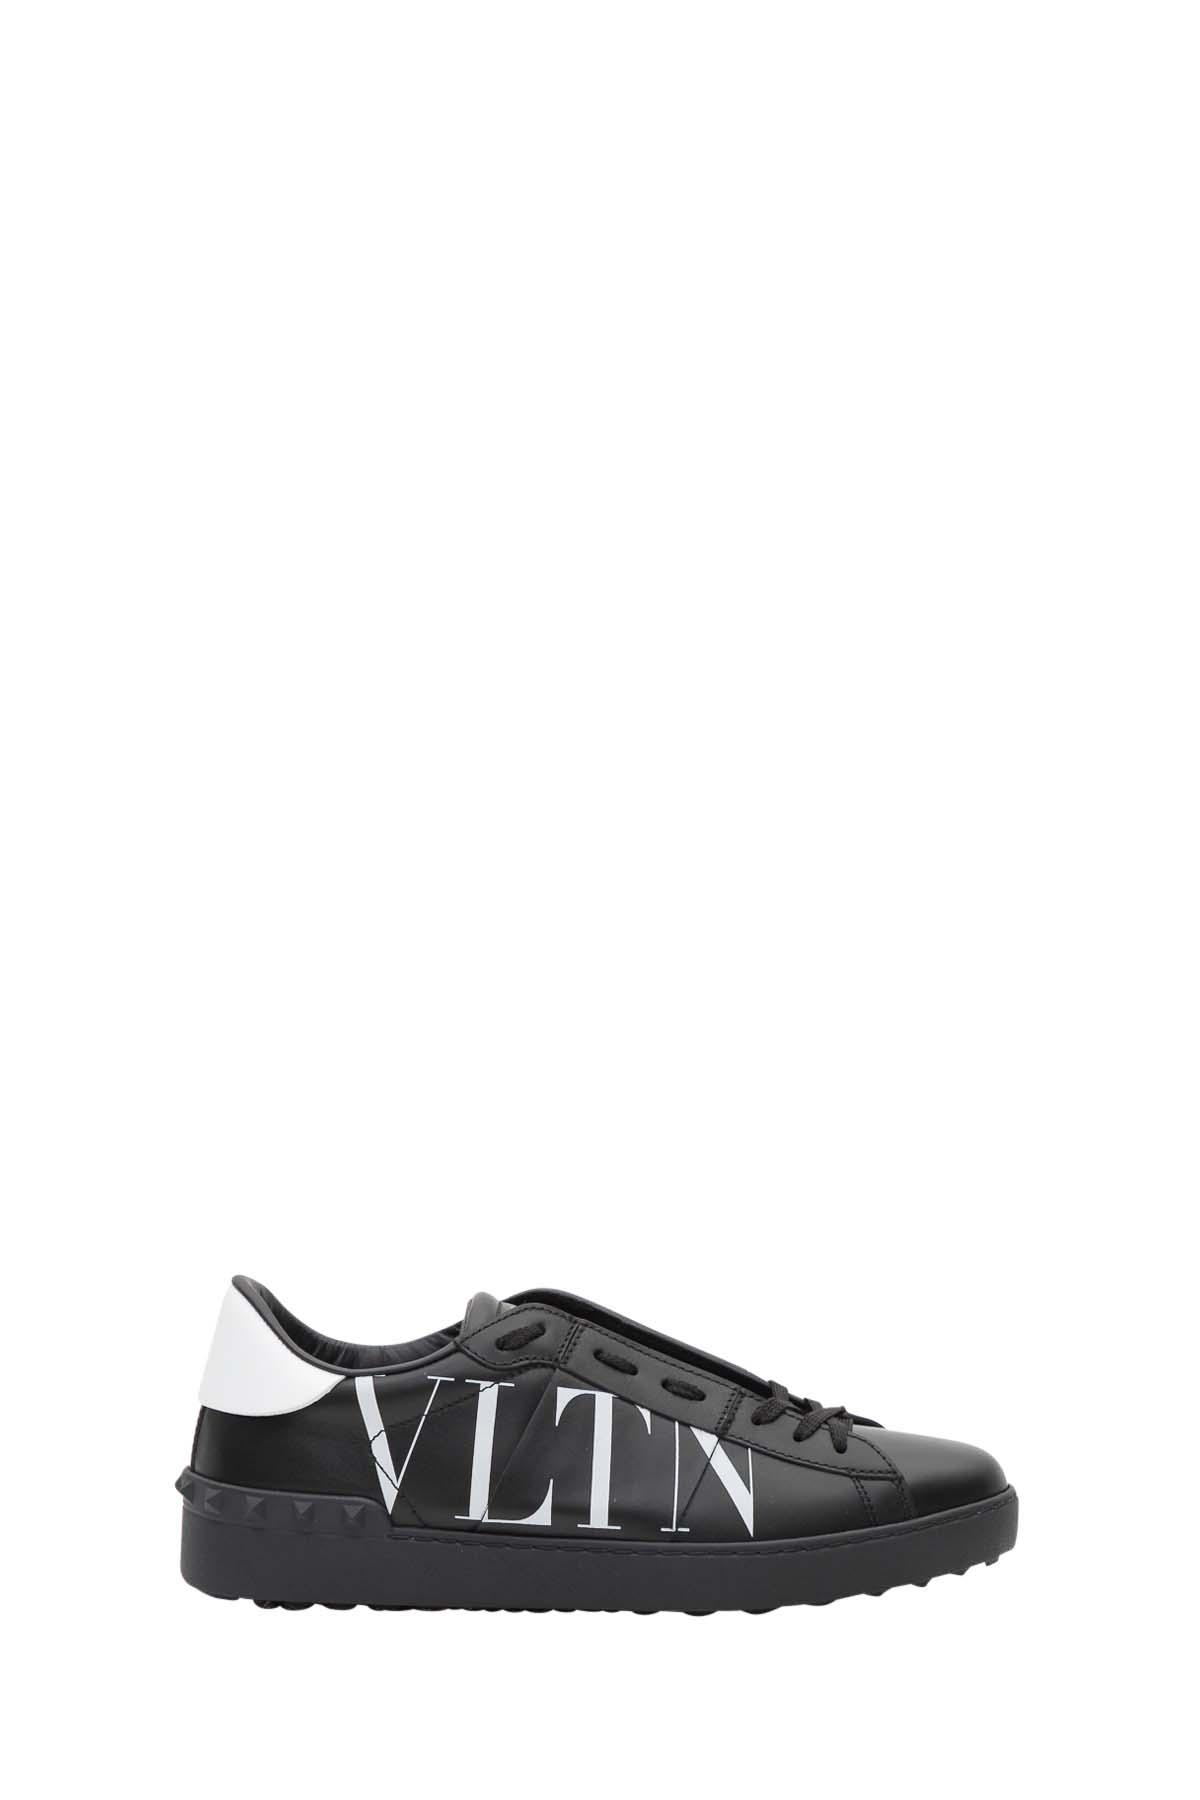 f002a9c1cc4f Valentino Garavani Valentino Garavani Vltn Open Sneaker - Black ...